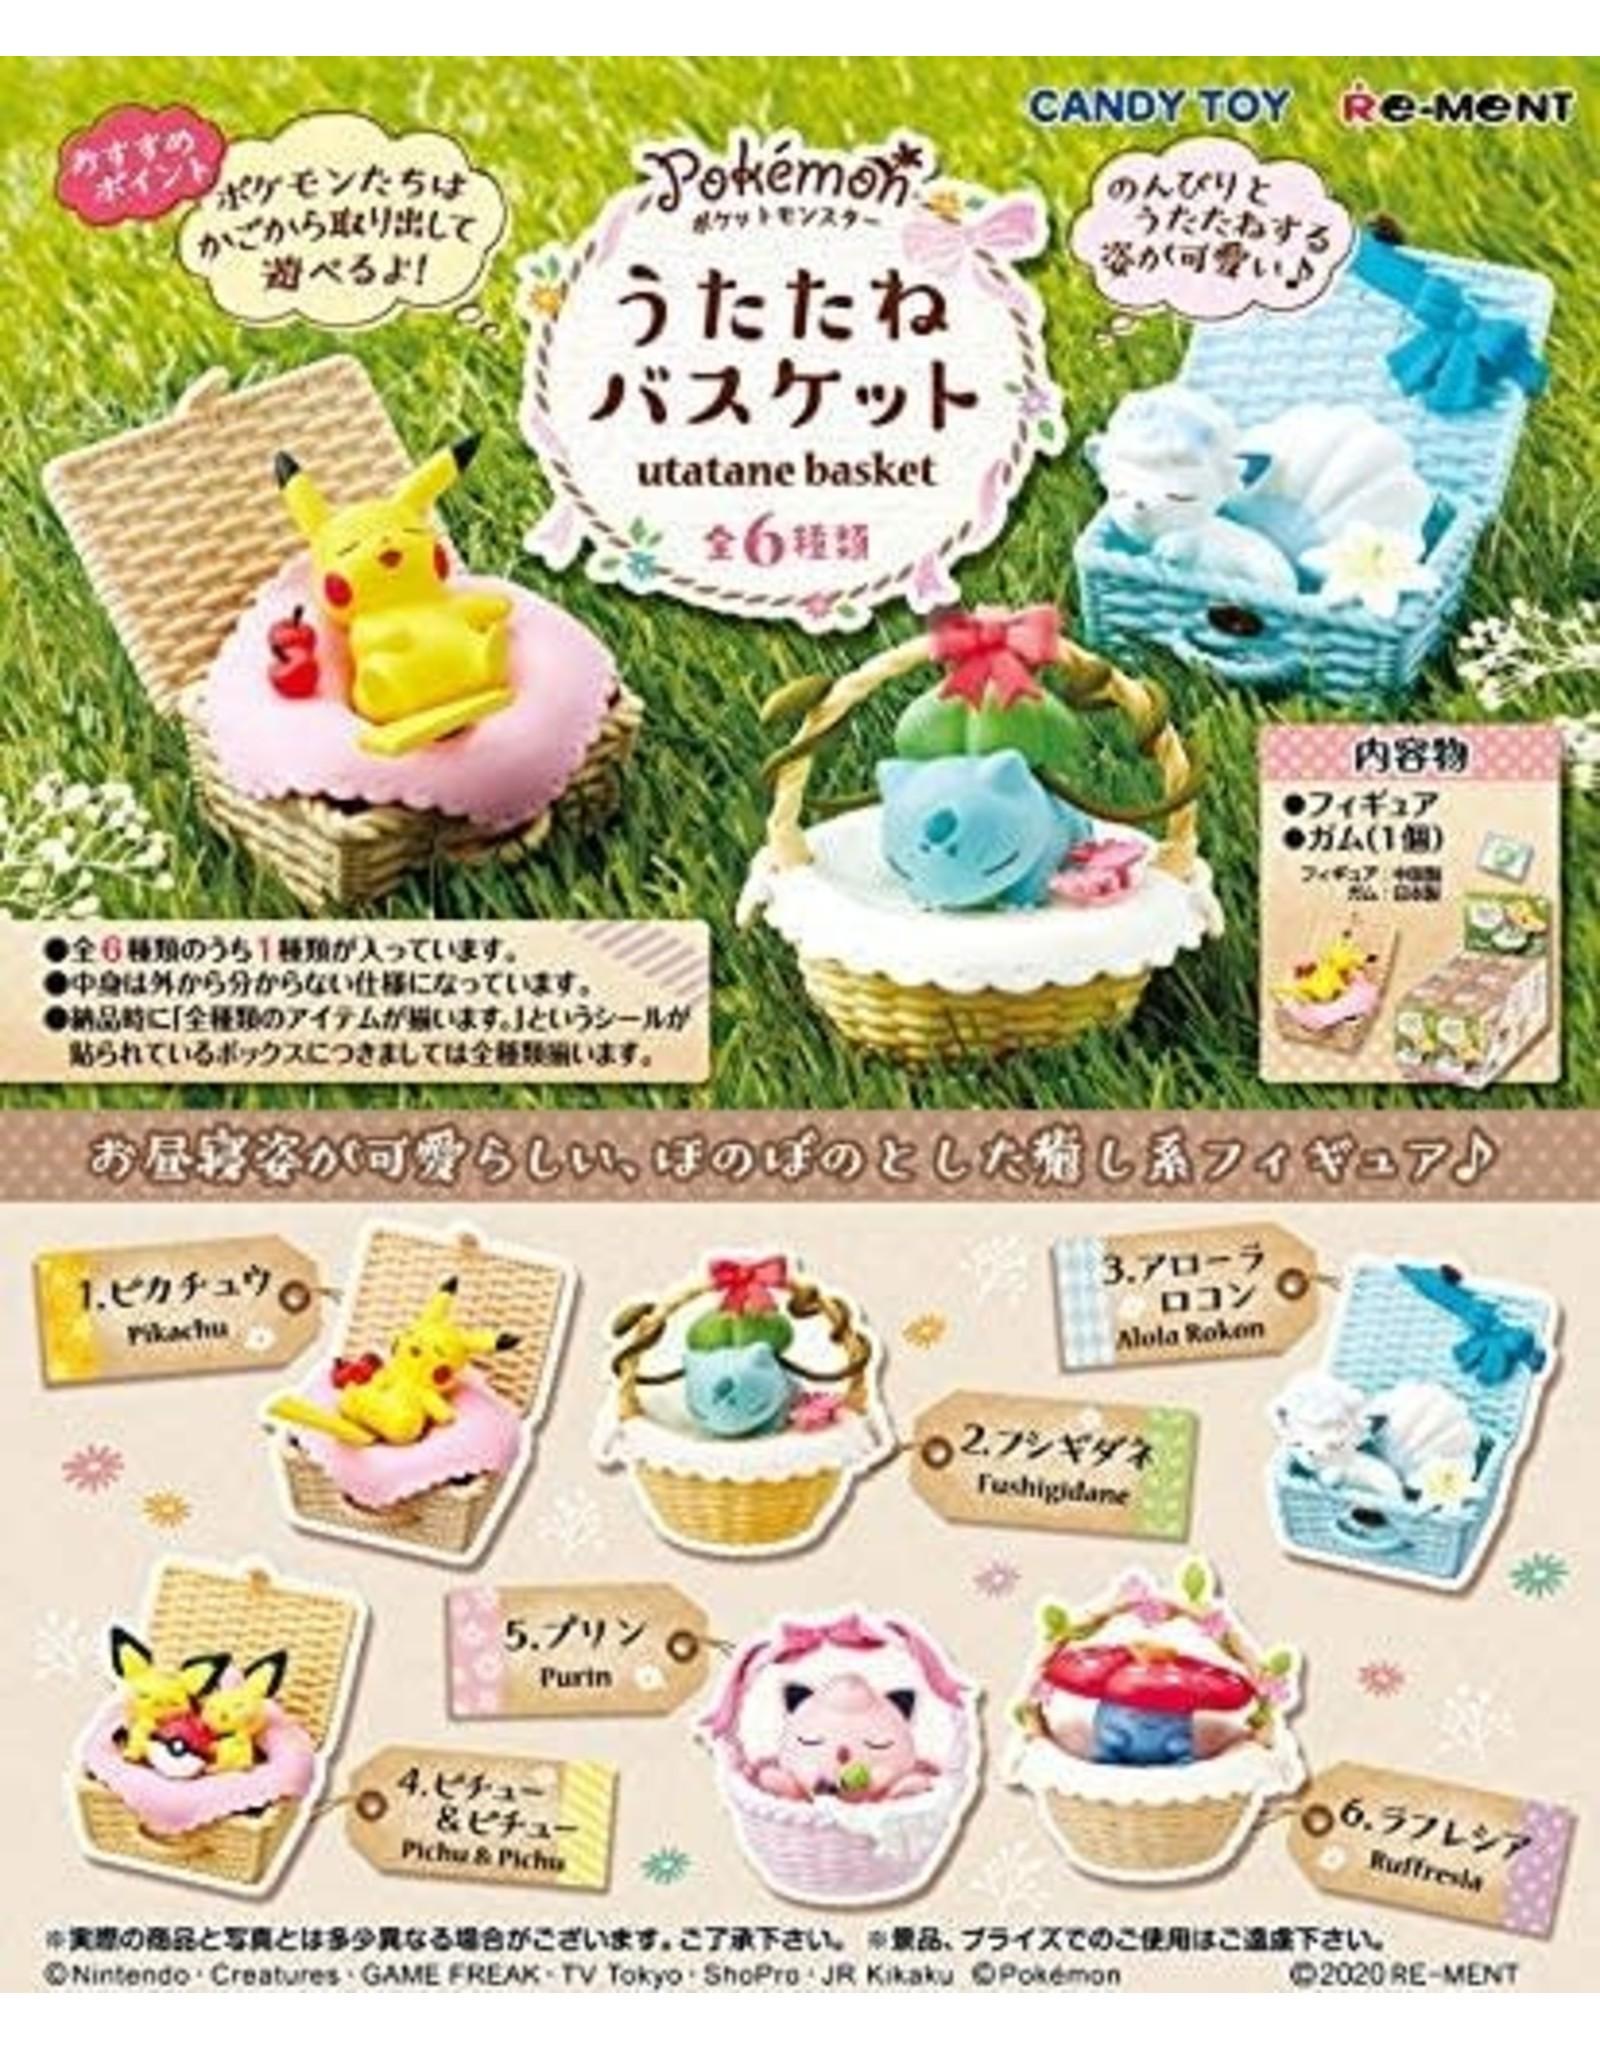 Re-Ment - Pokémon - Utatane Basket - 1 random item